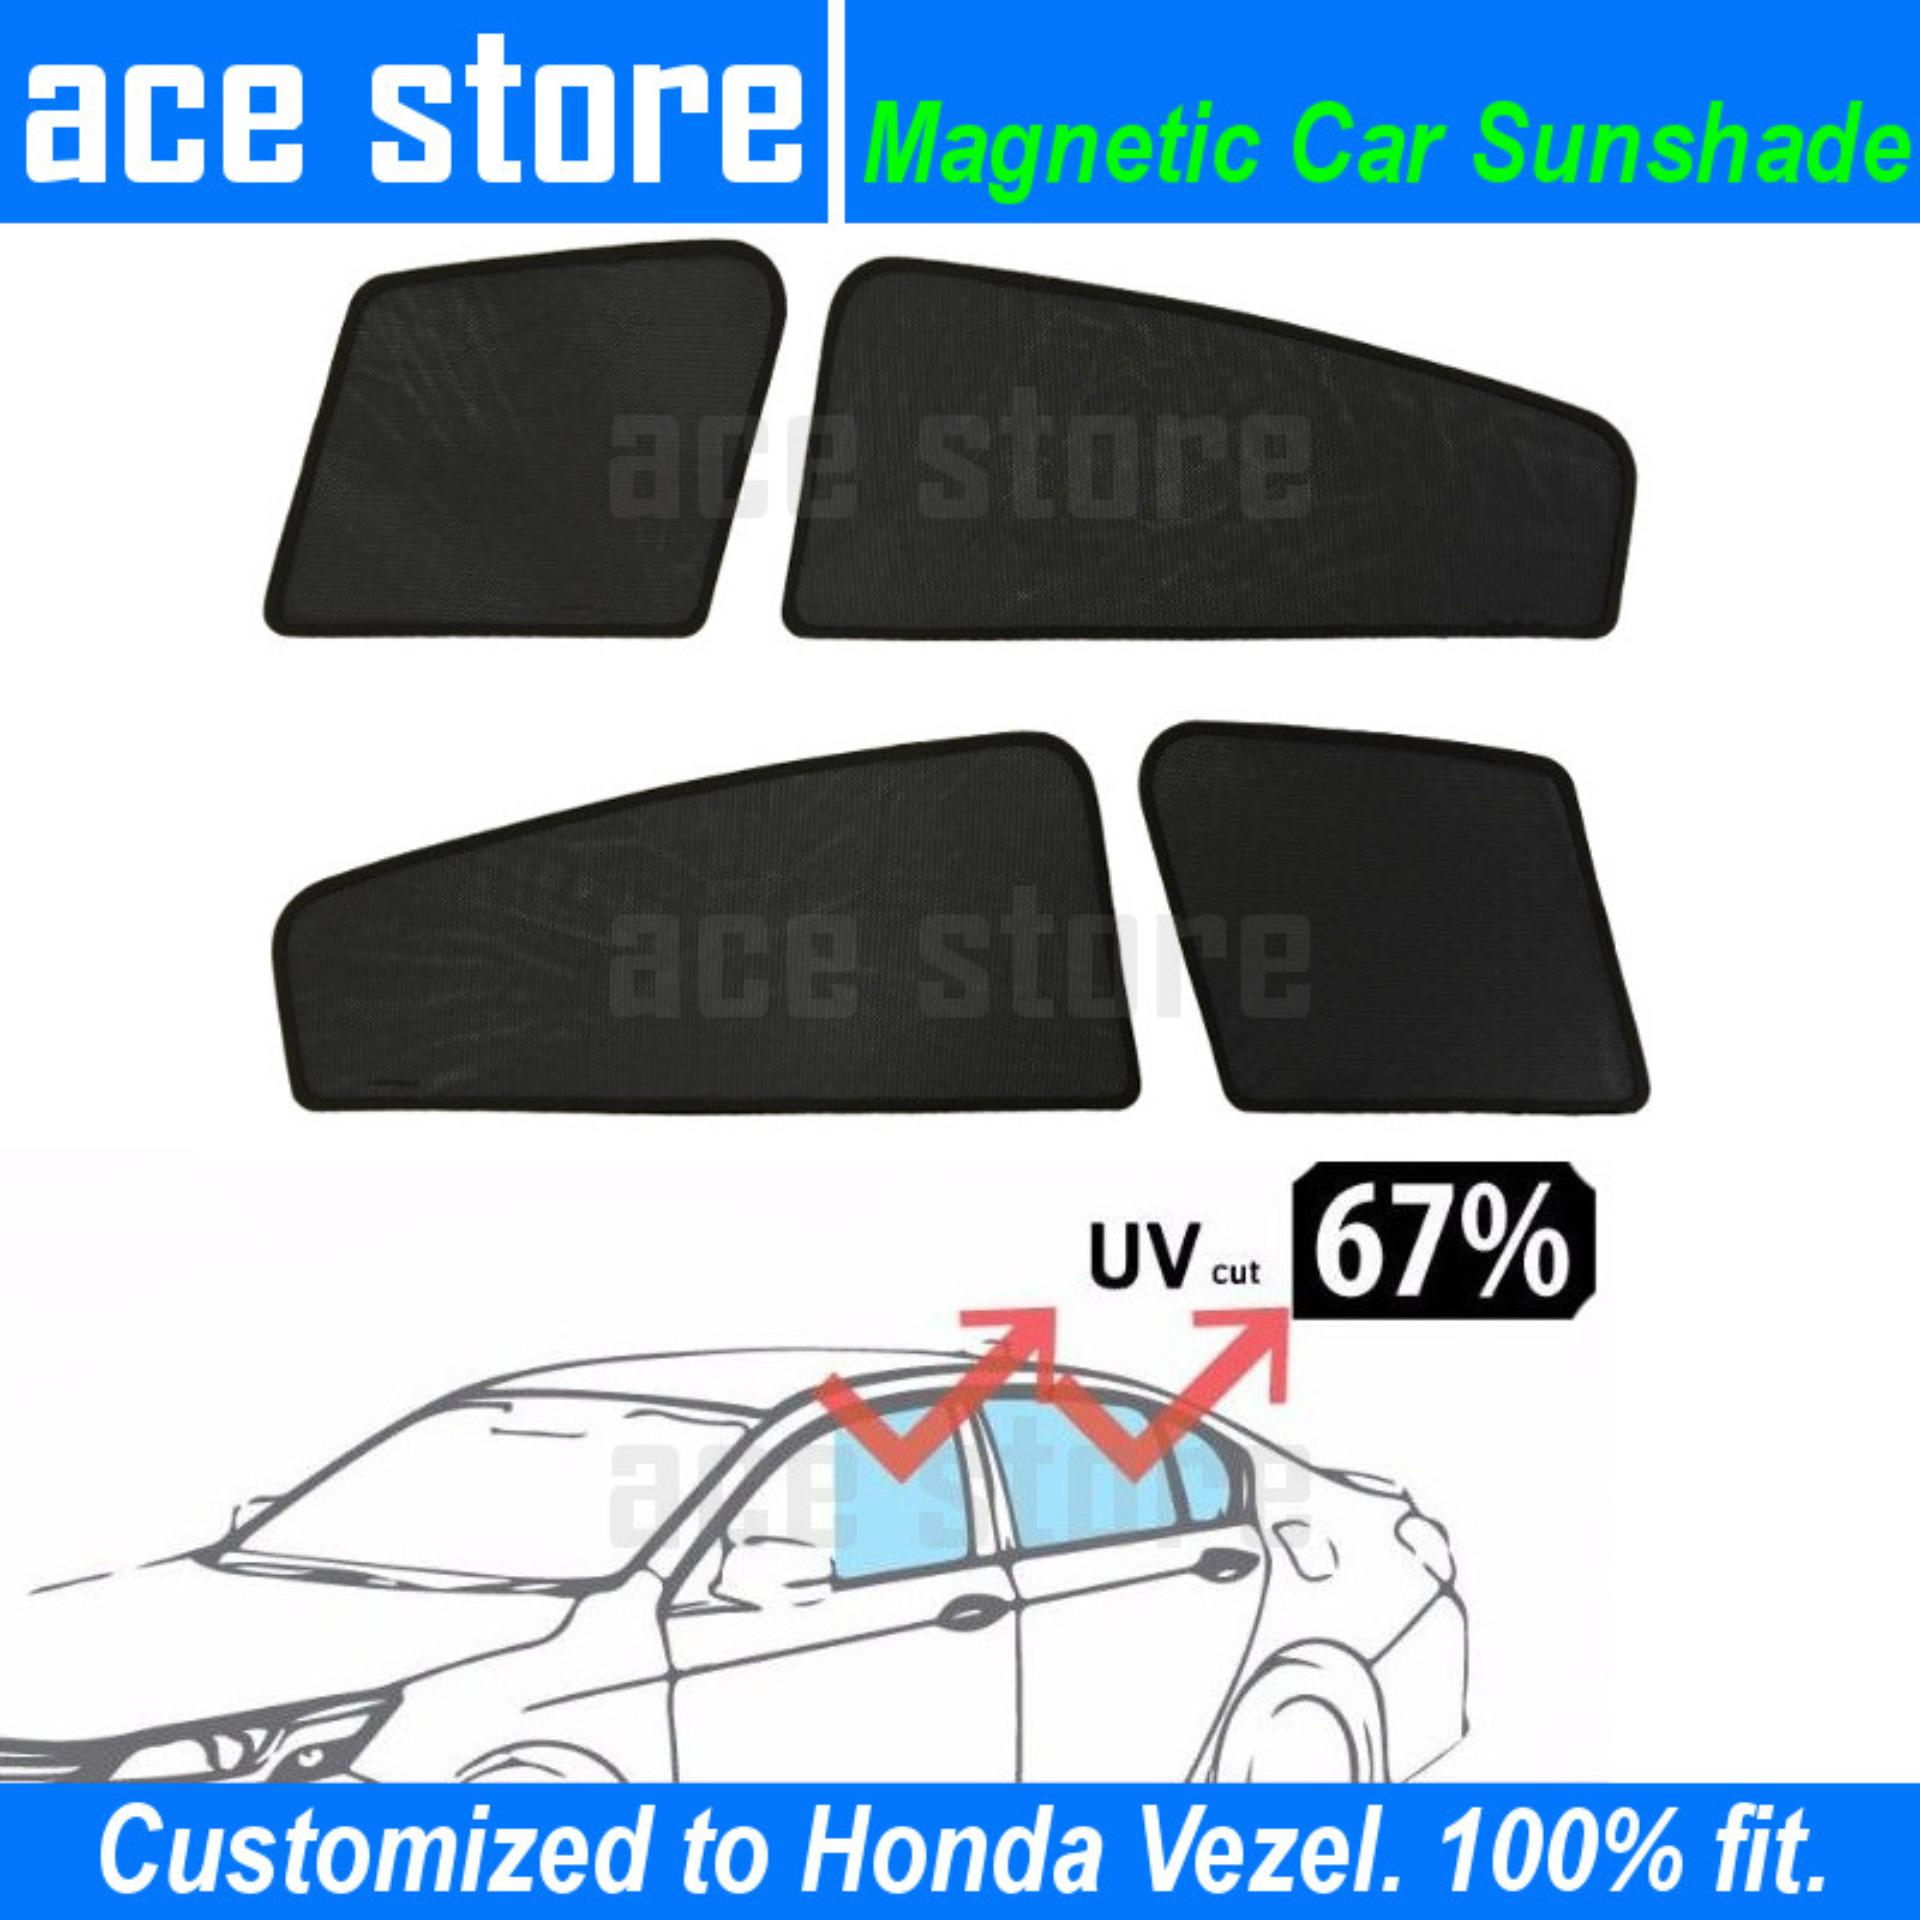 Sale Magnetic Sunshade For Car Honda Vezel Ace Store On Singapore